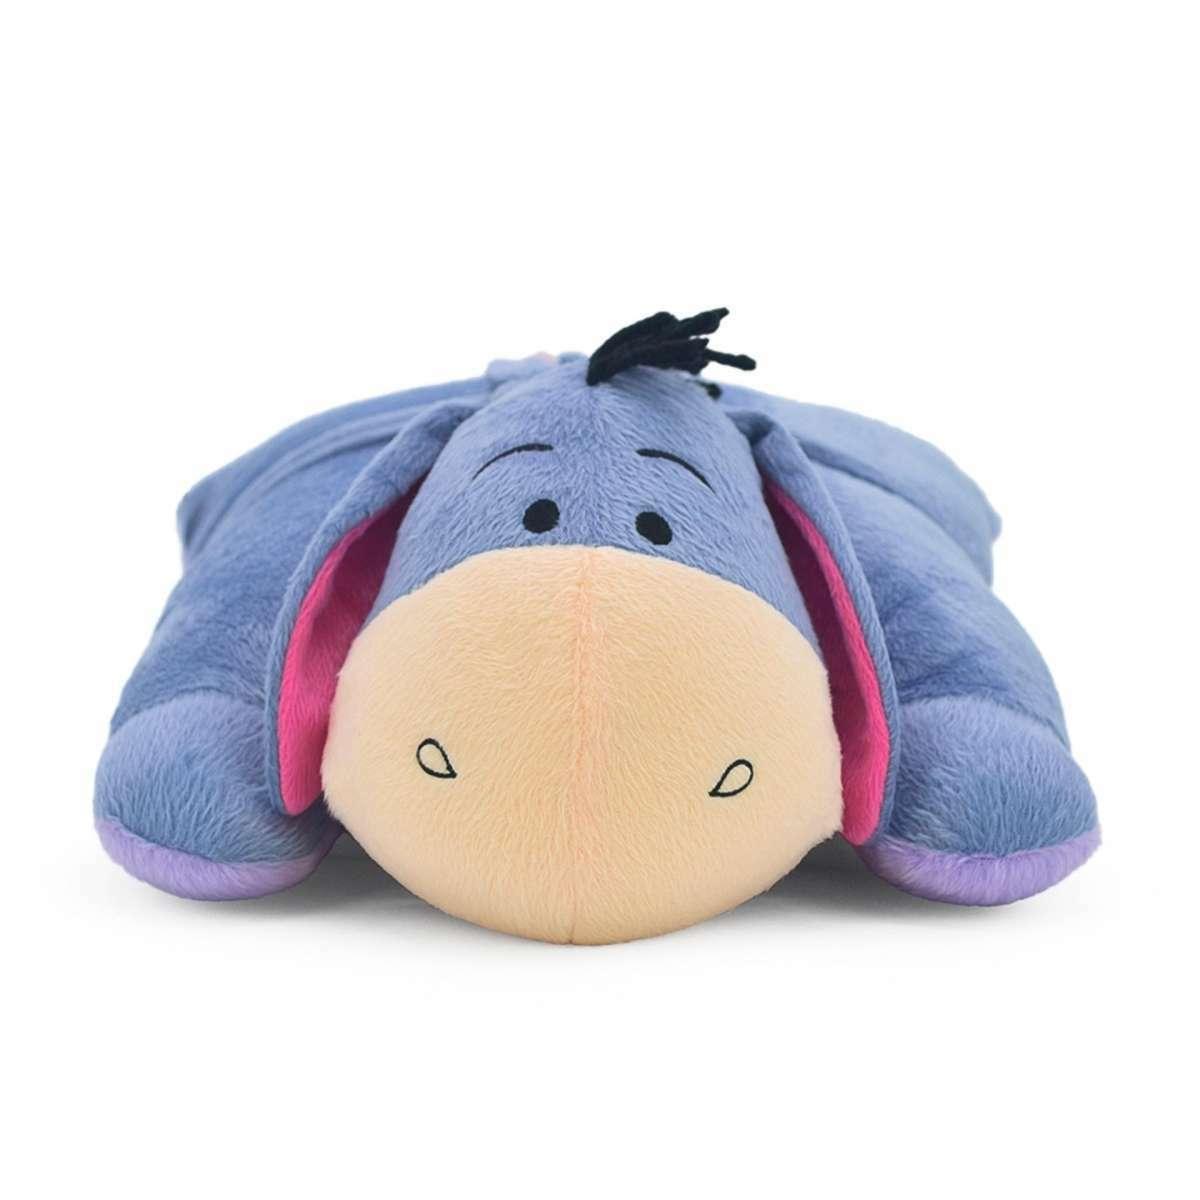 Winnie the Pooh EEYORE Plush Doll Soft Toys Pillow Pets Cush